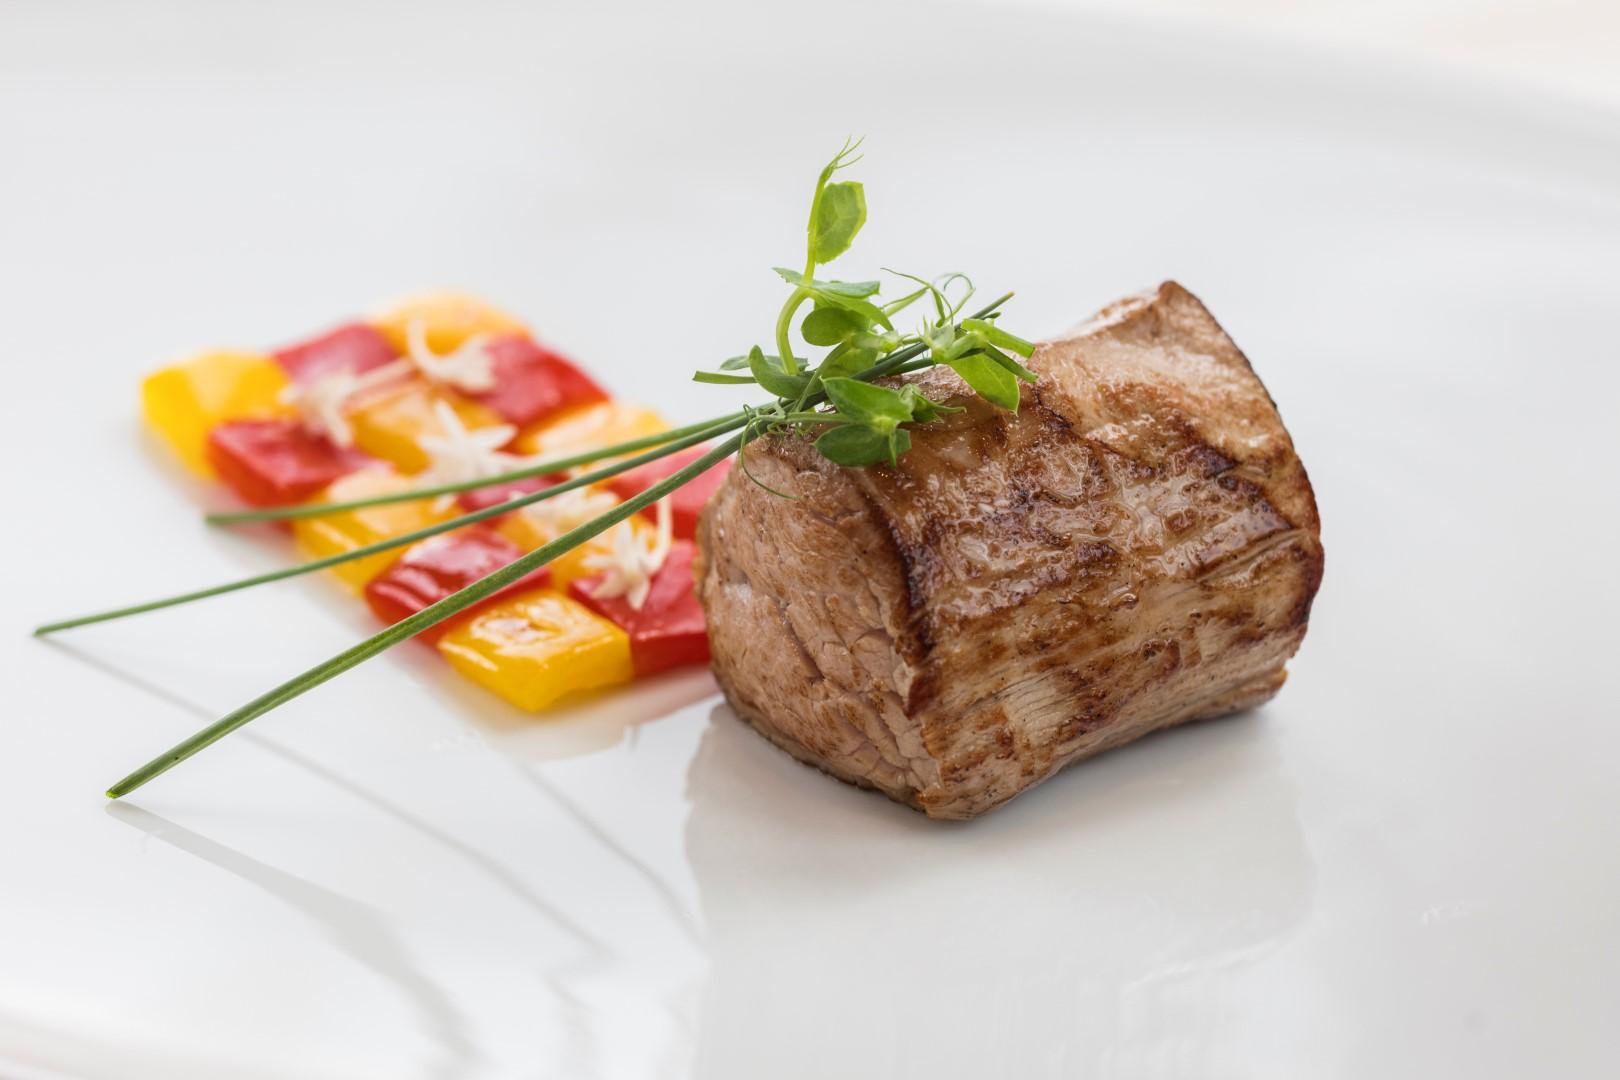 Fotografija gastronomije - biftek